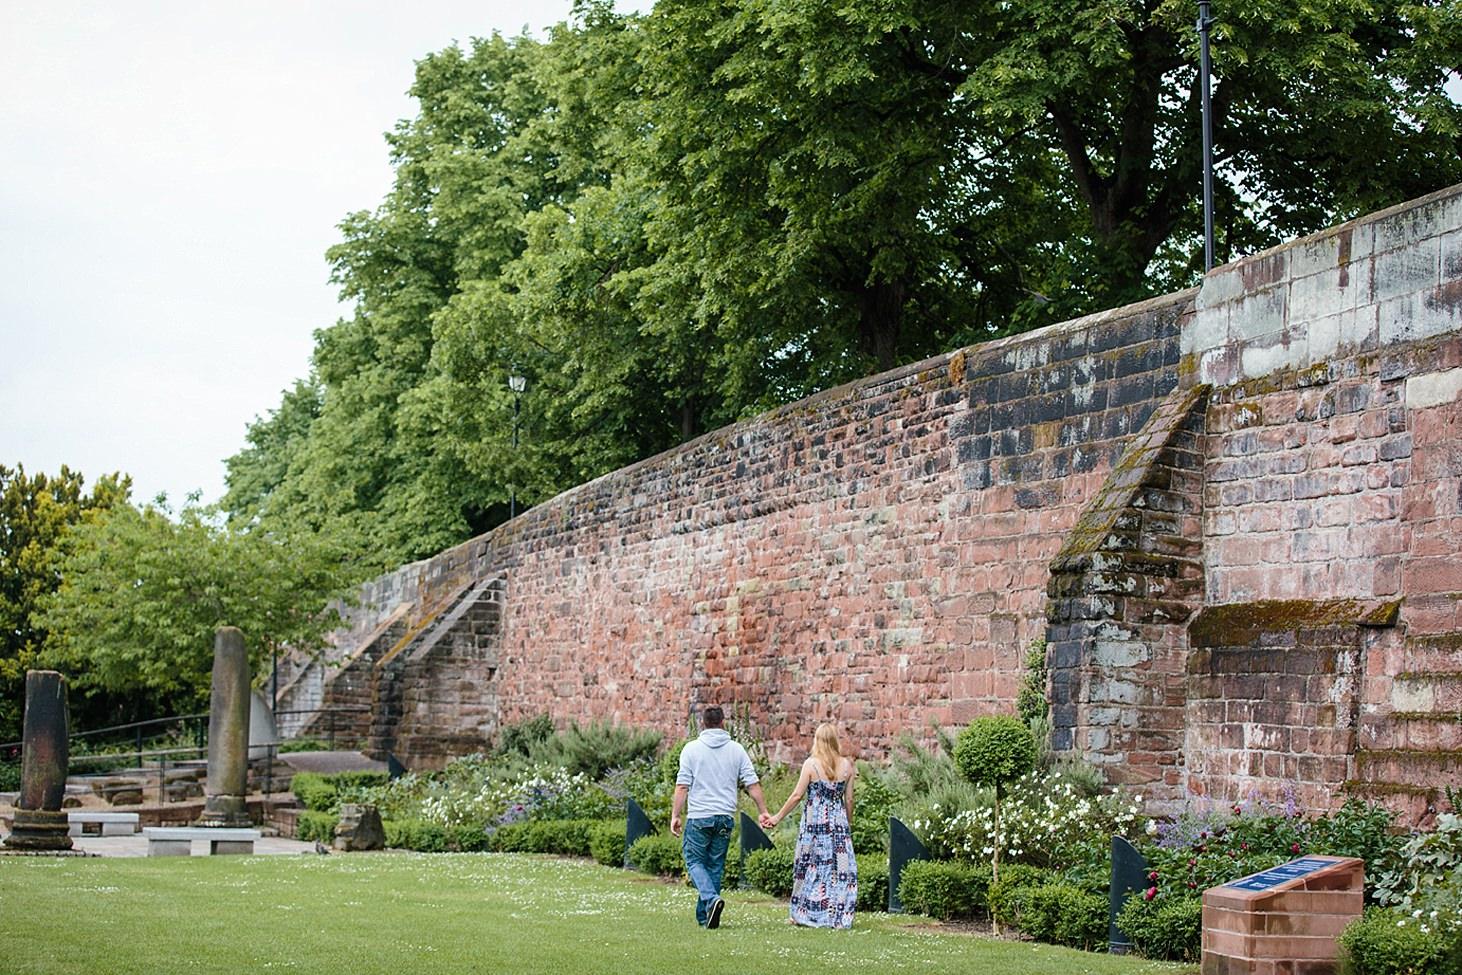 chester engagement shoot couple walking through gardens